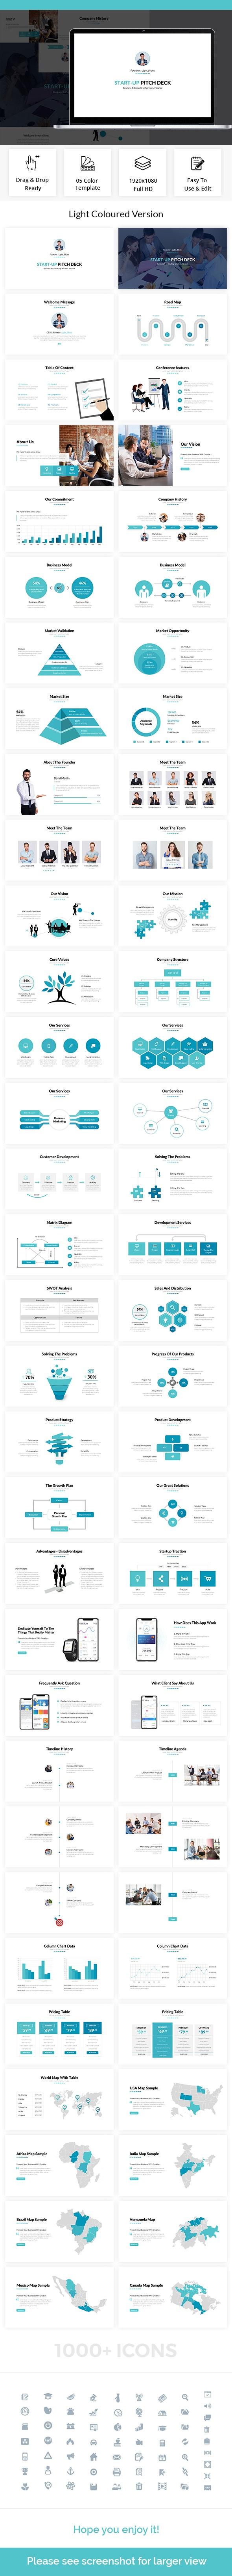 Start-Up Pitch Deck Powerpoint Template 2018 - PowerPoint Templates Presentation Templates